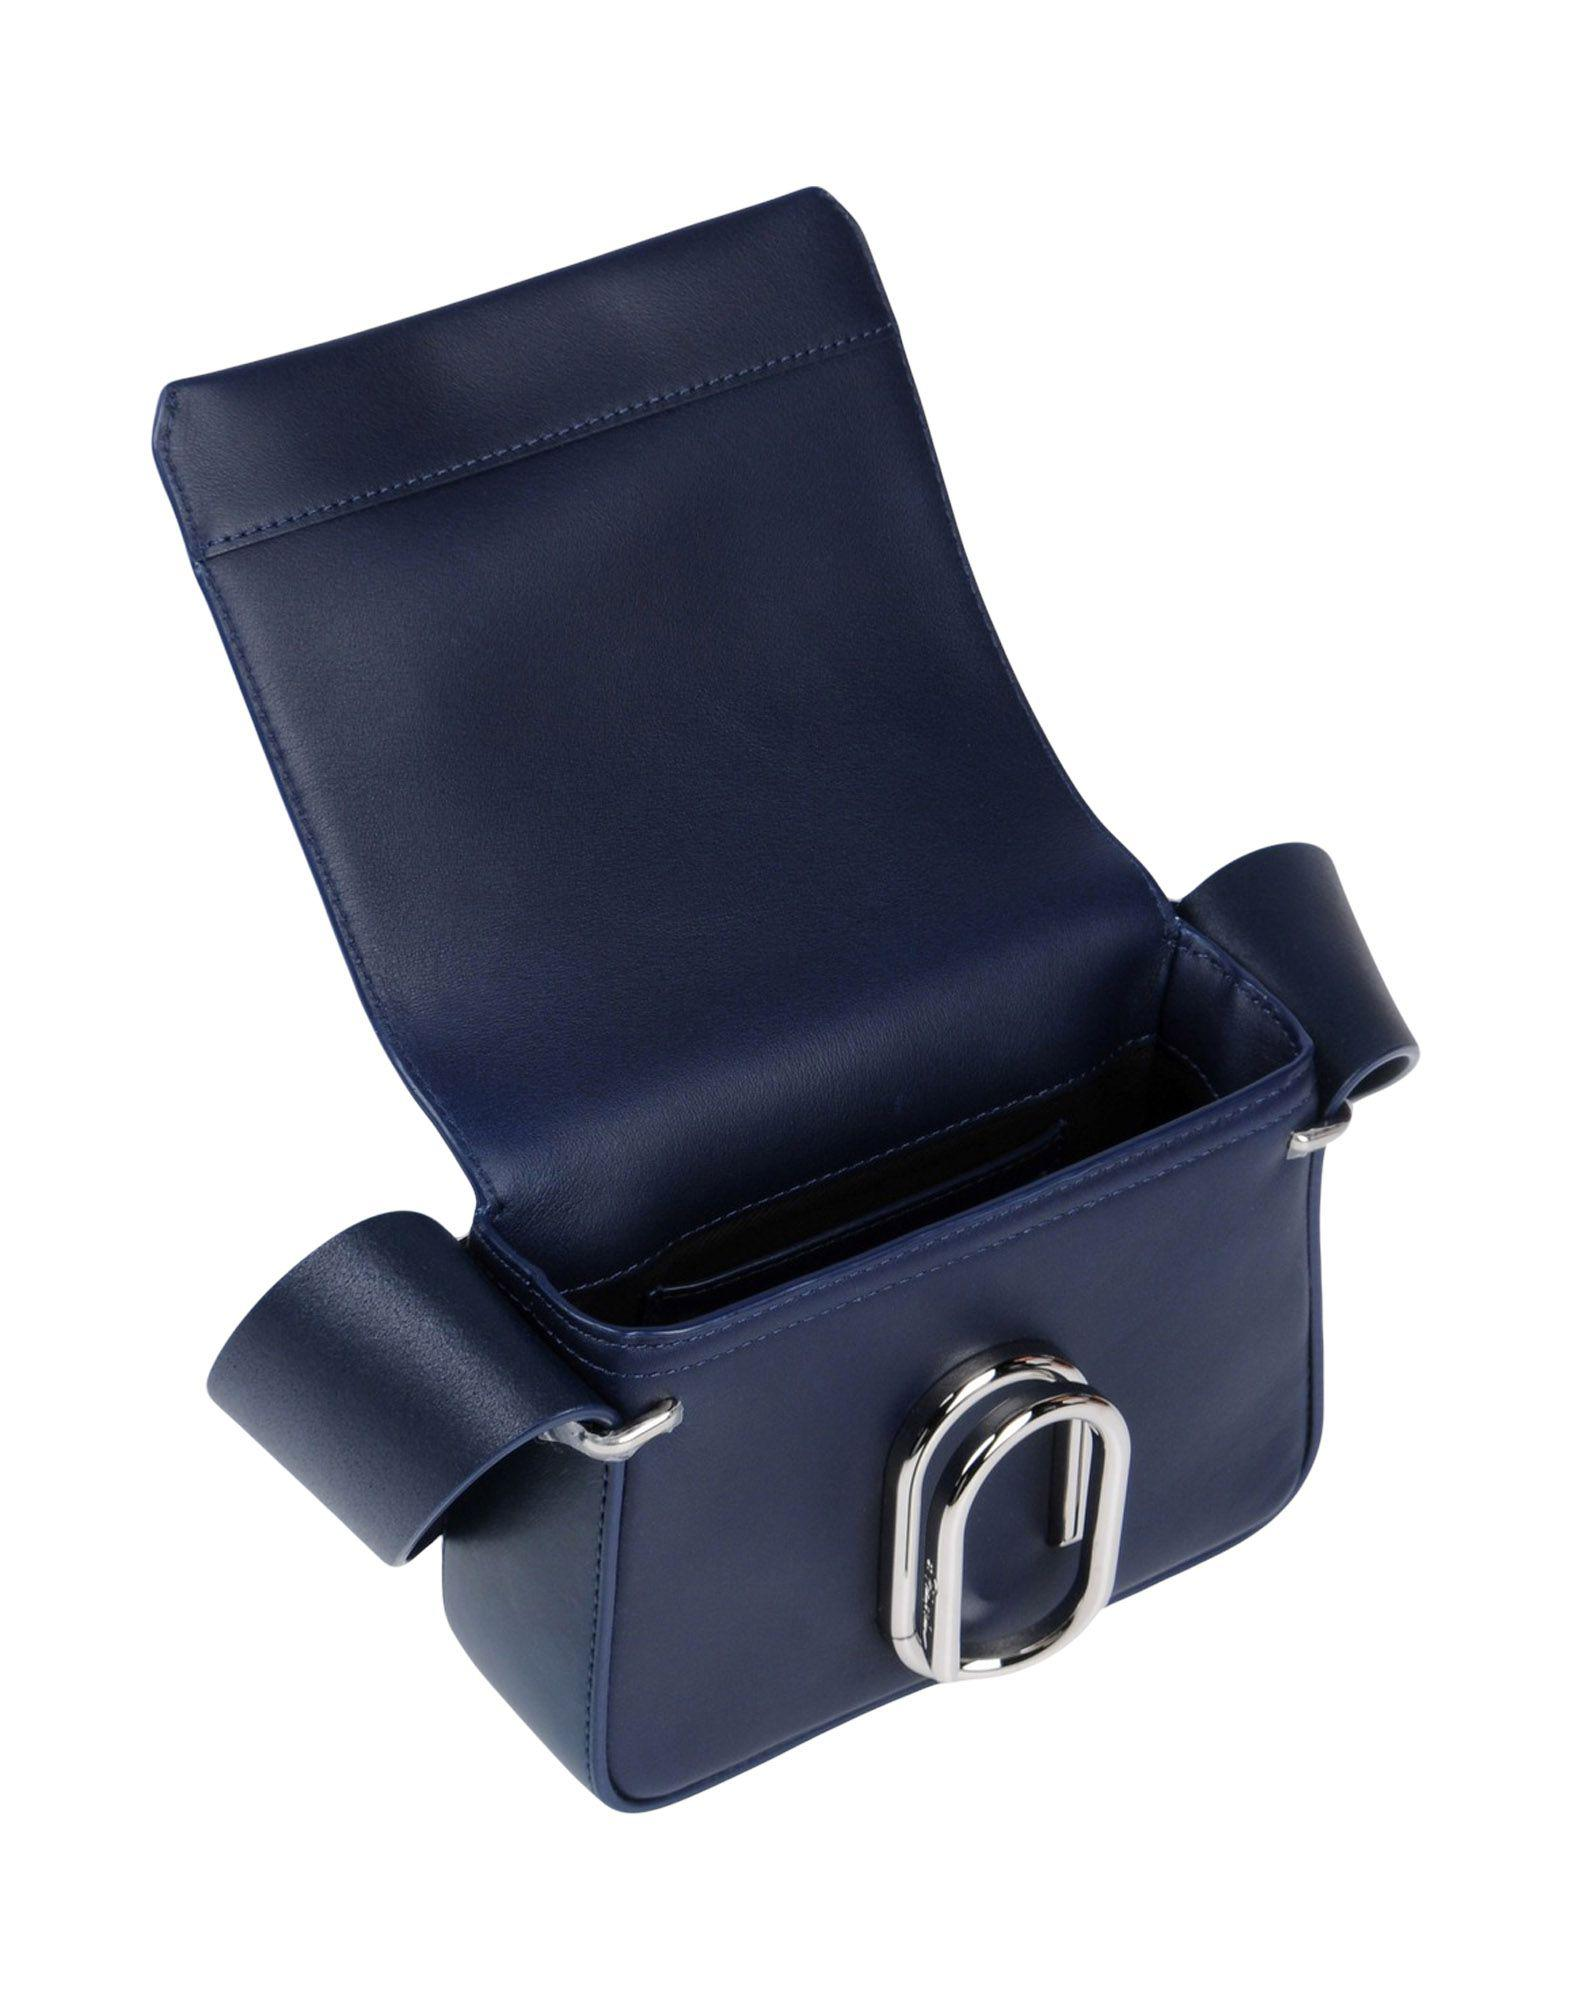 3.1 Phillip Lim Leather Cross-body Bag in Dark Blue (Blue)